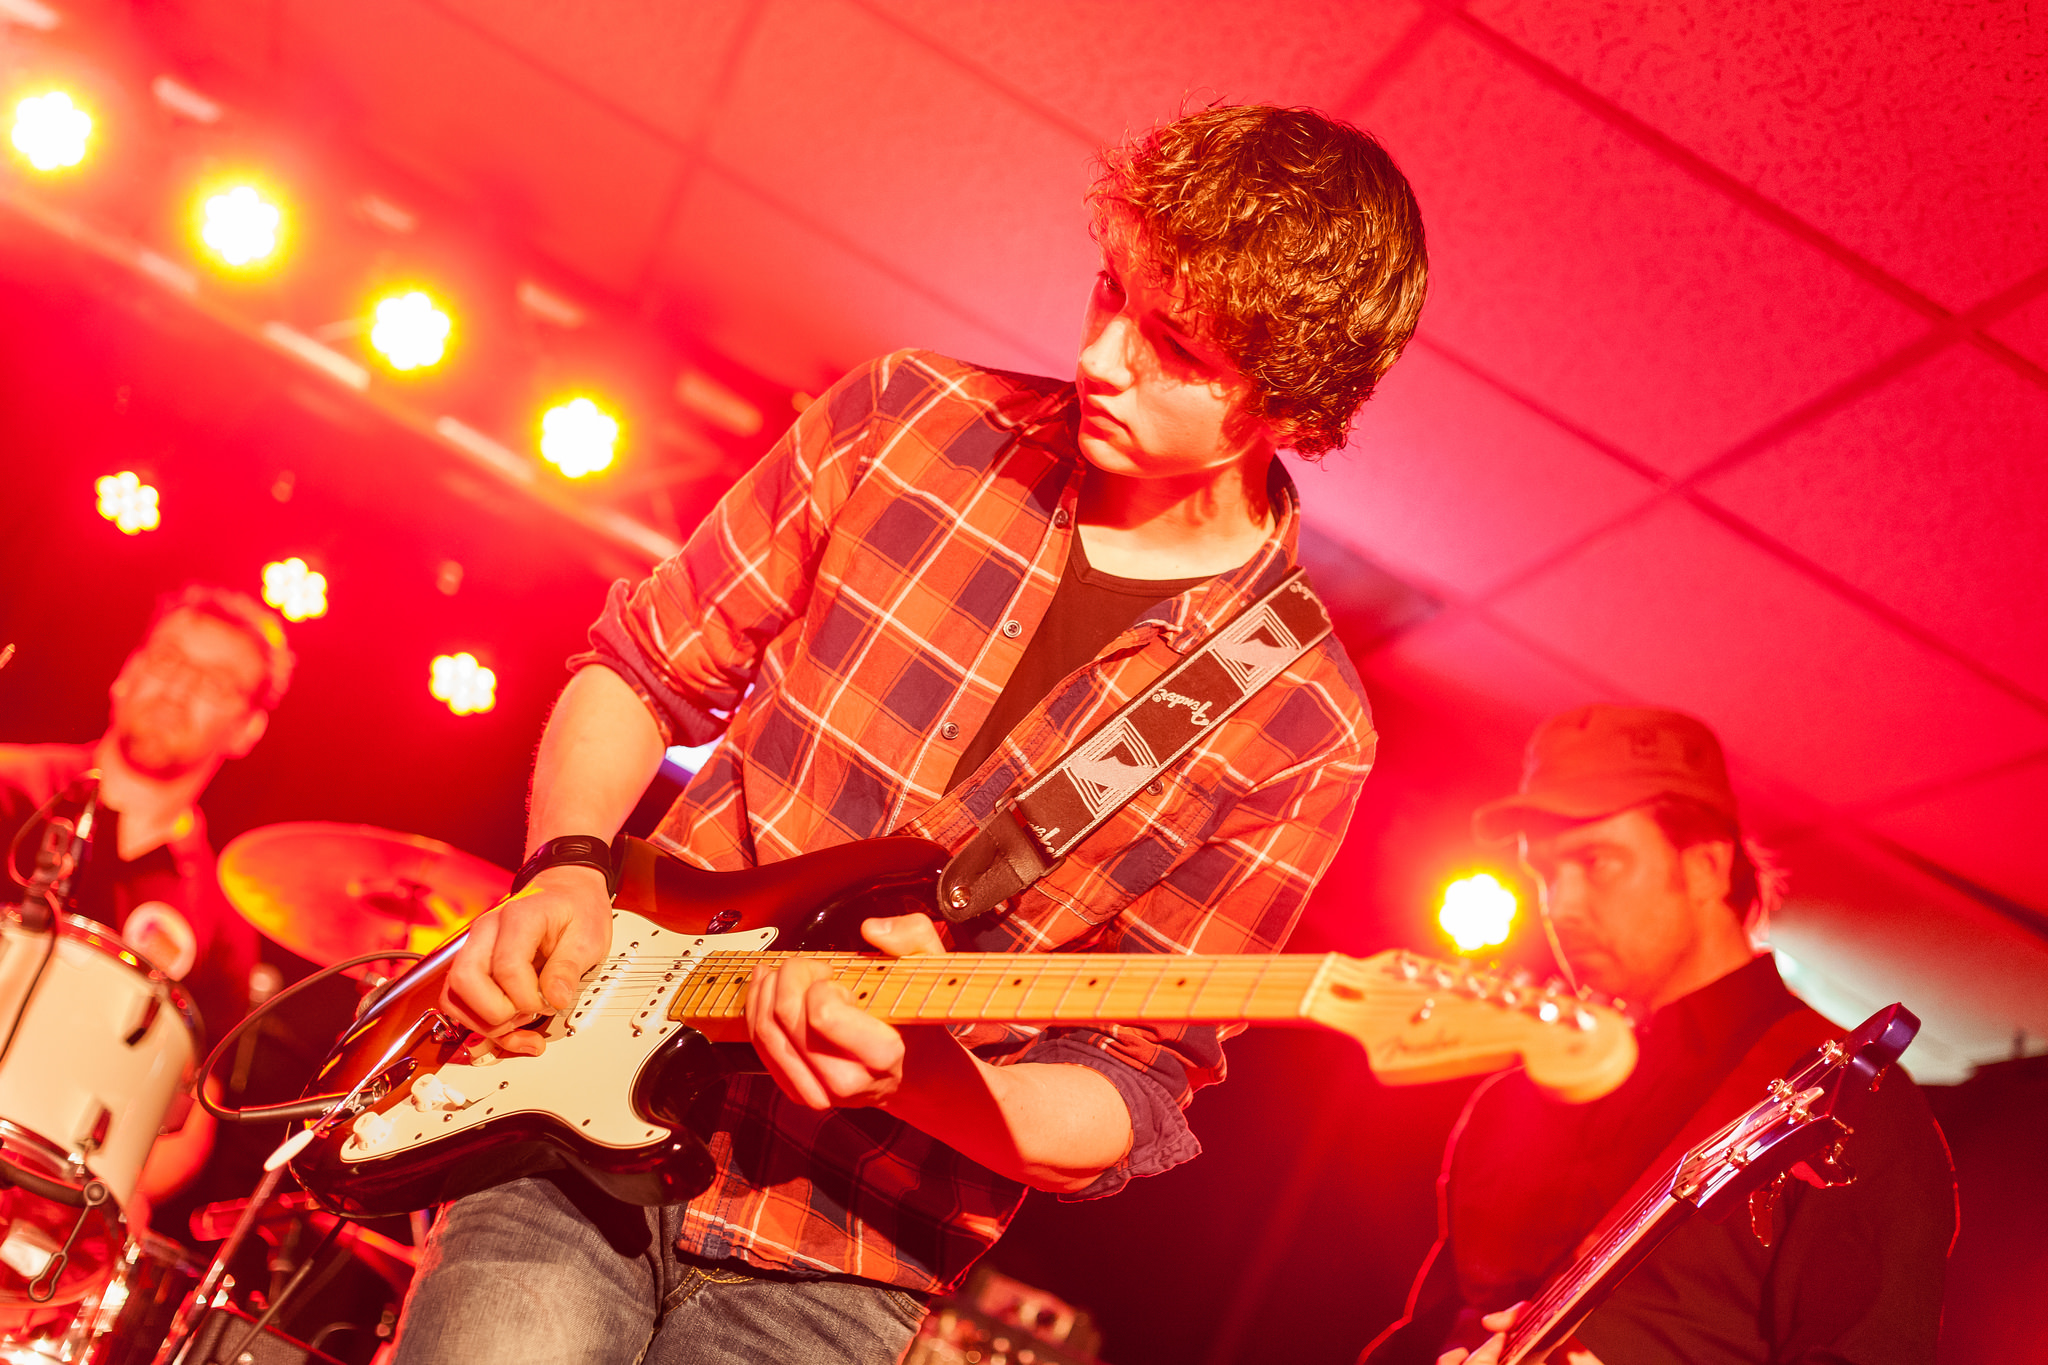 Tom Veltien in actie op het 'In The Attic' live music festival in Café Restaurant Marktzicht Heino.